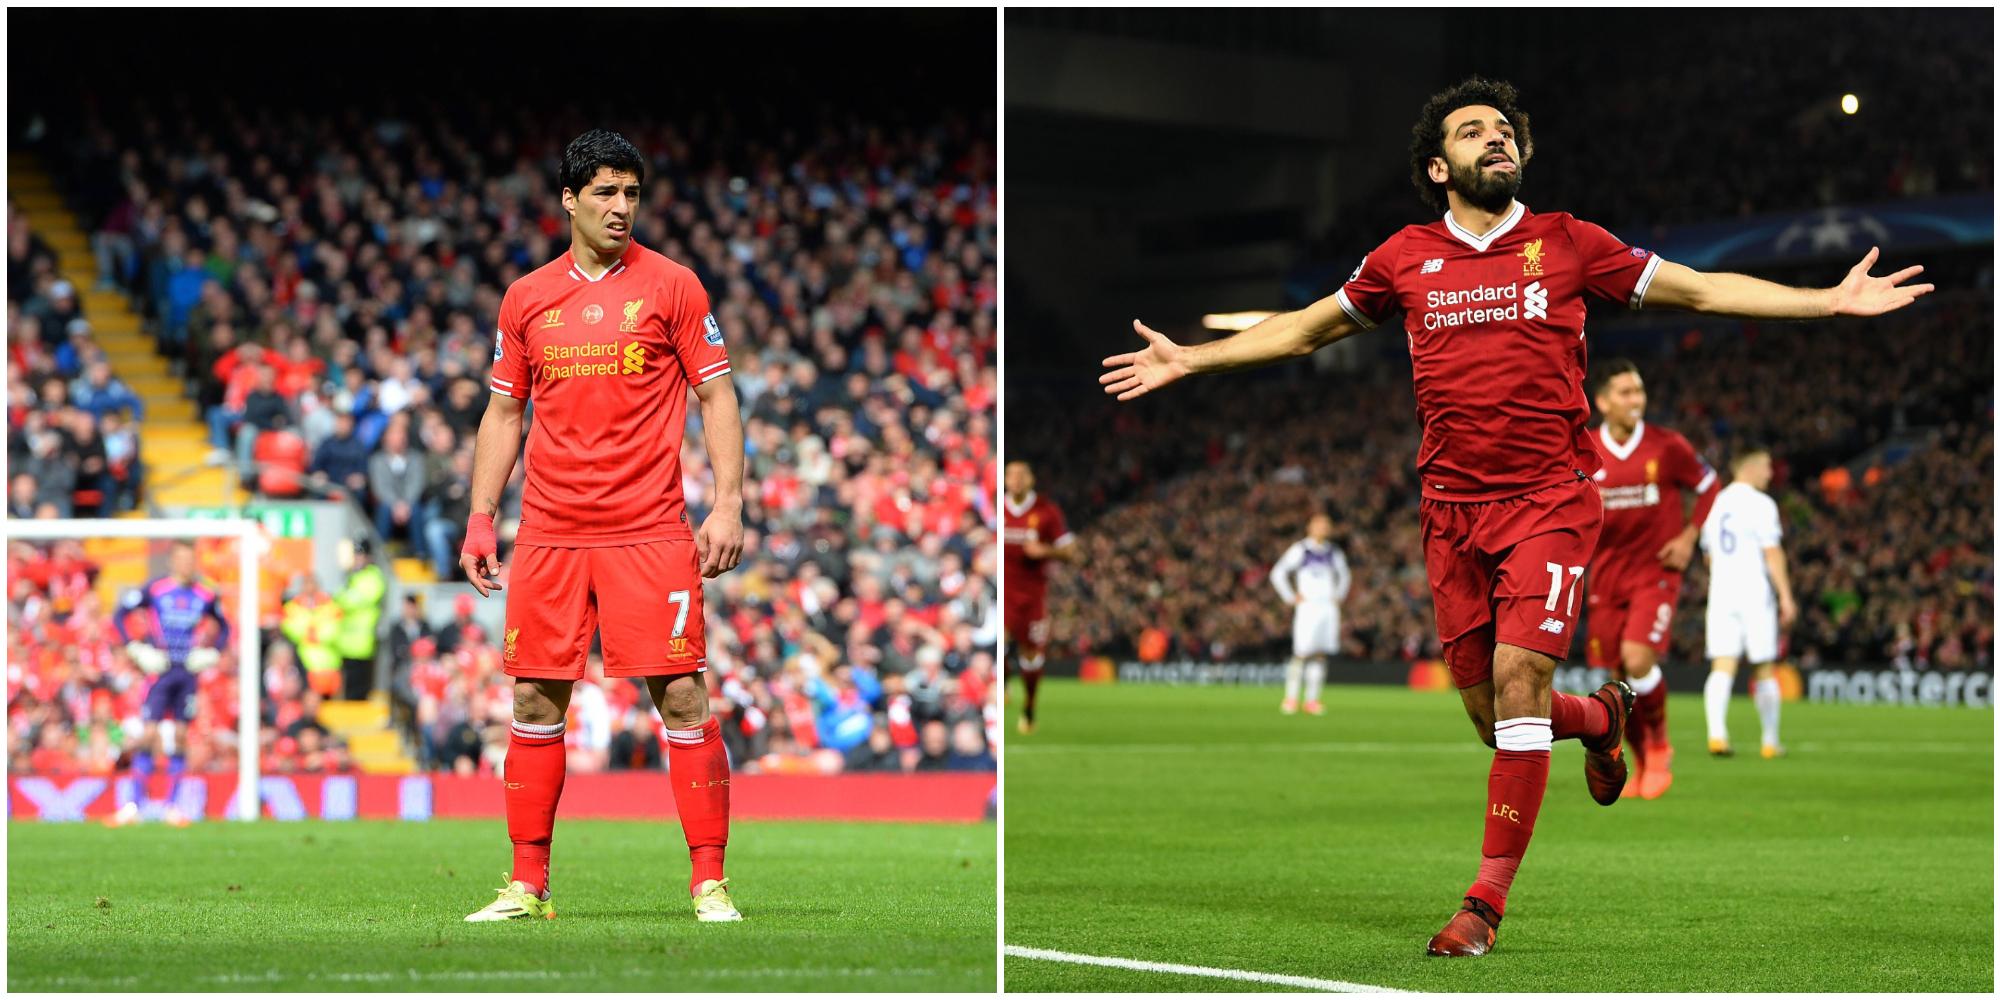 GUEST: Criminally underrated Salah's 2017/18 is better than Suarez's 2013/14 season